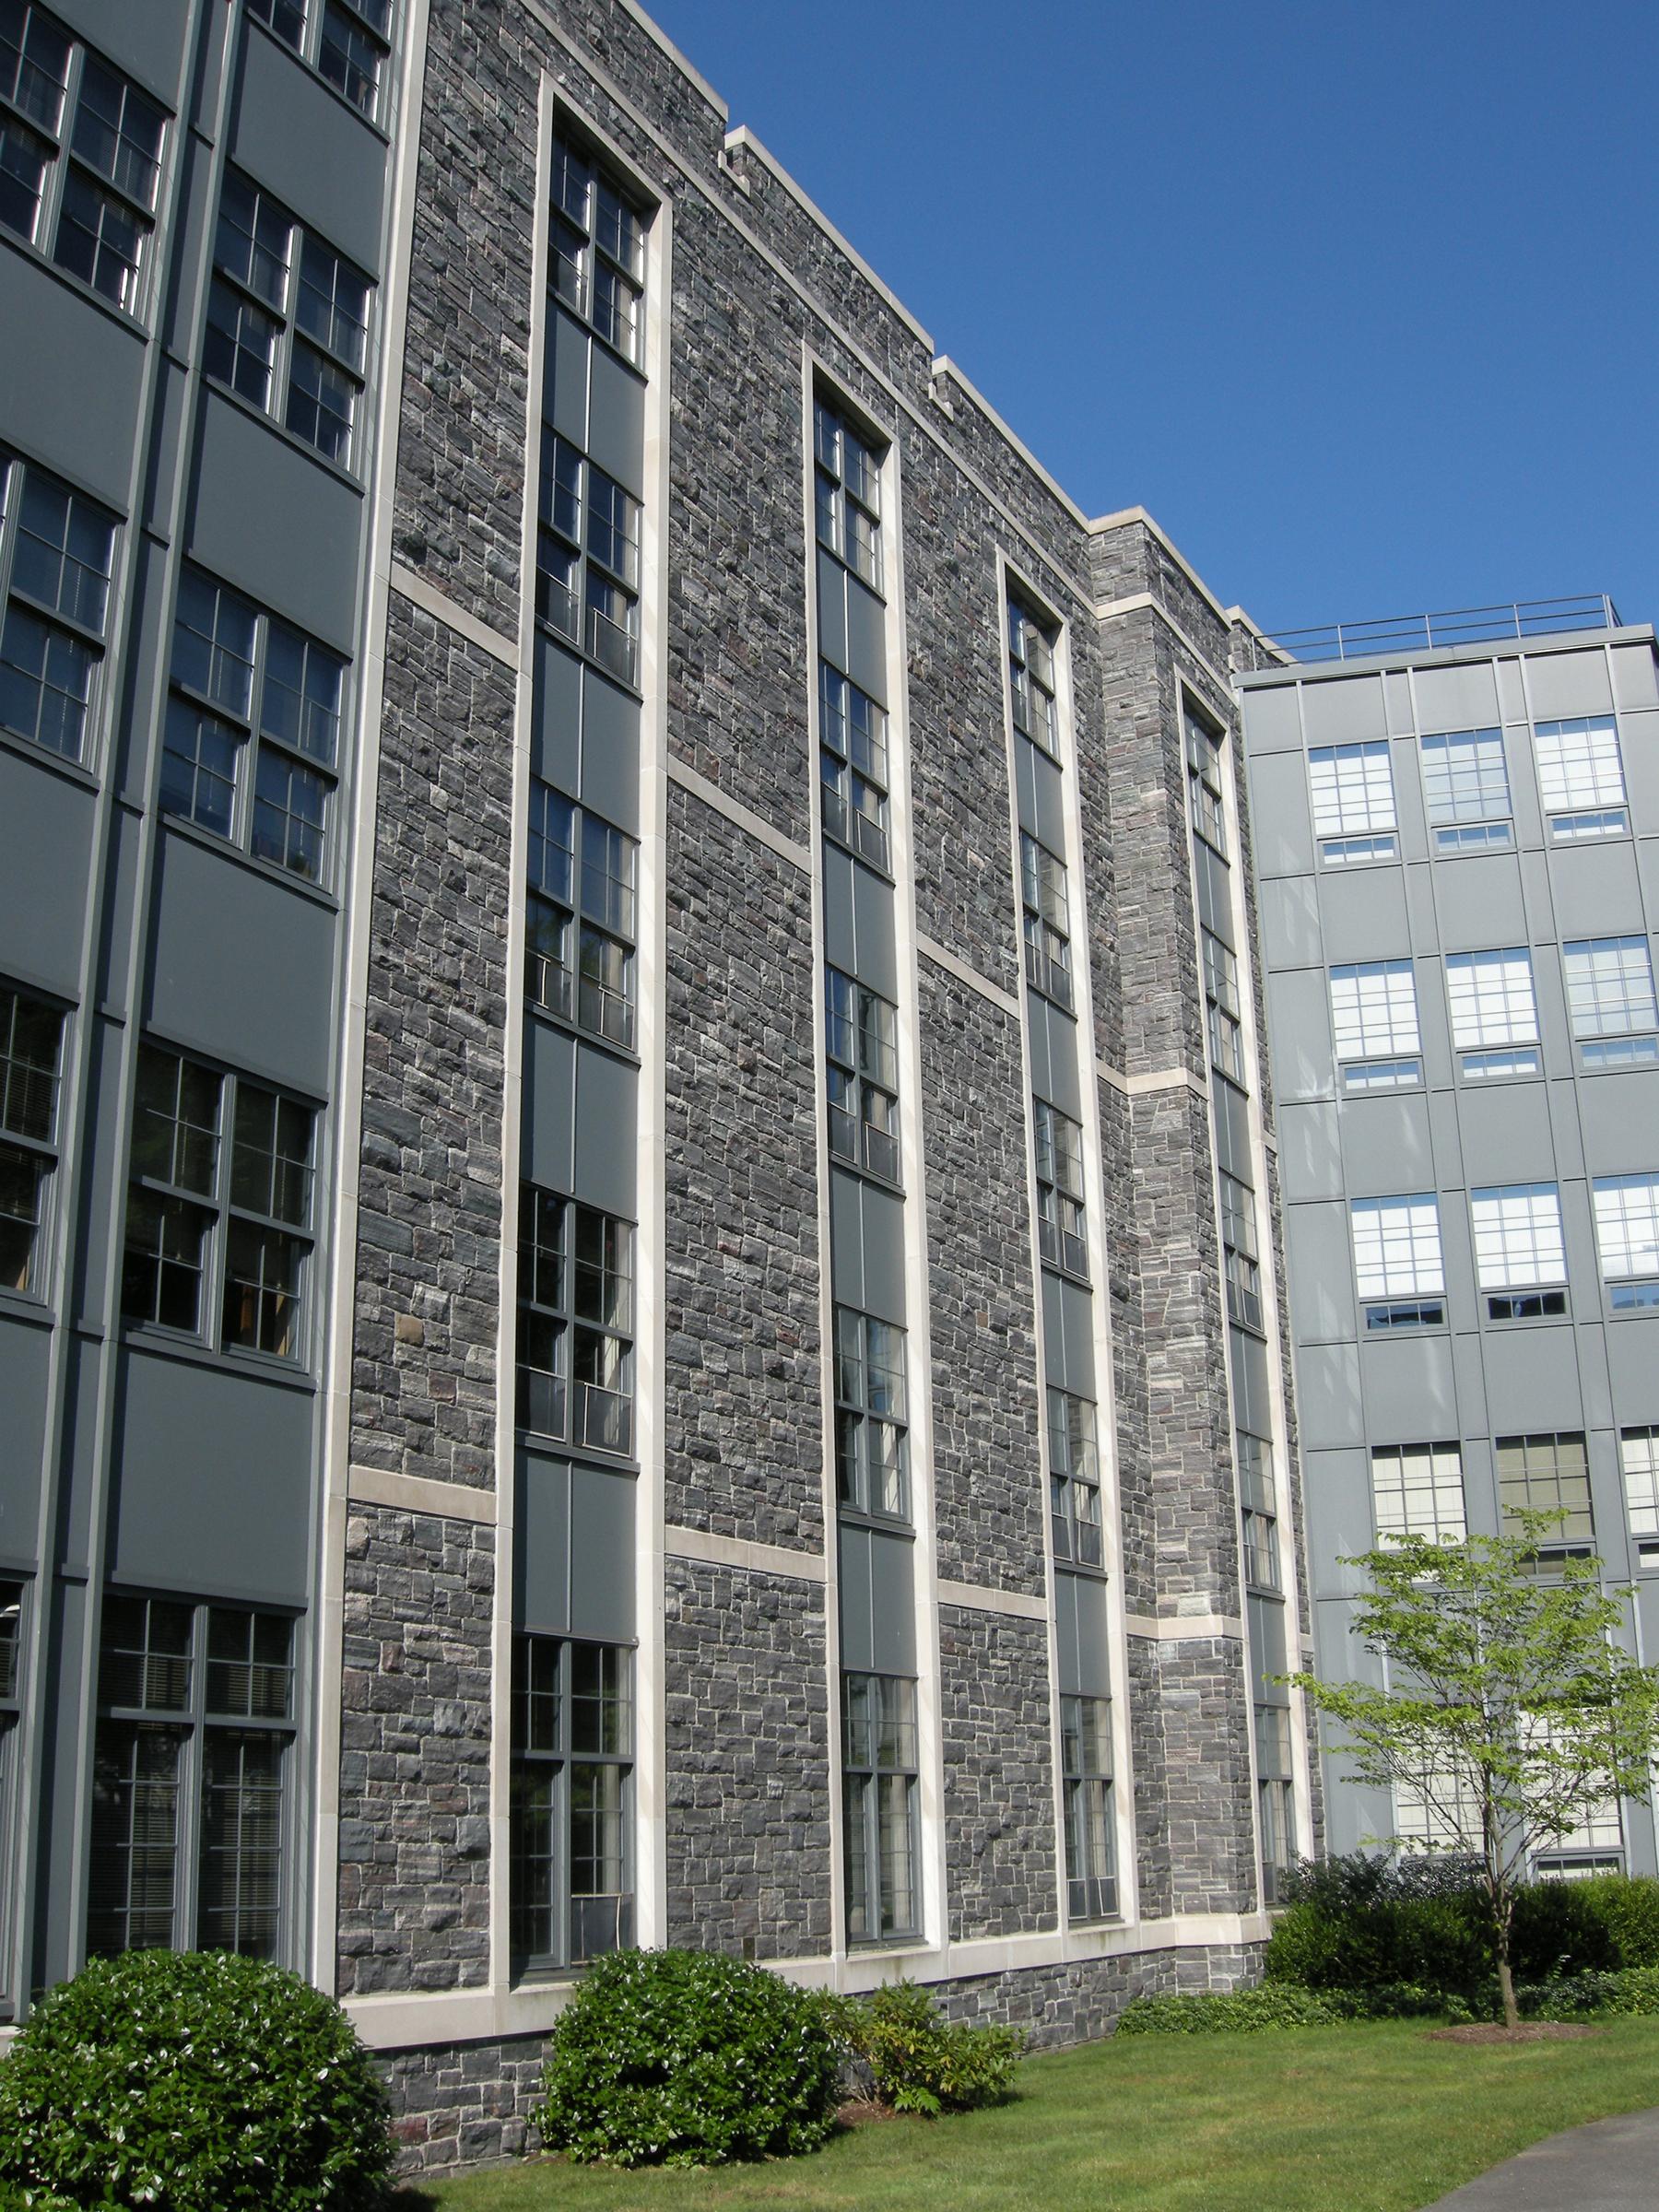 stone exterior on dorms